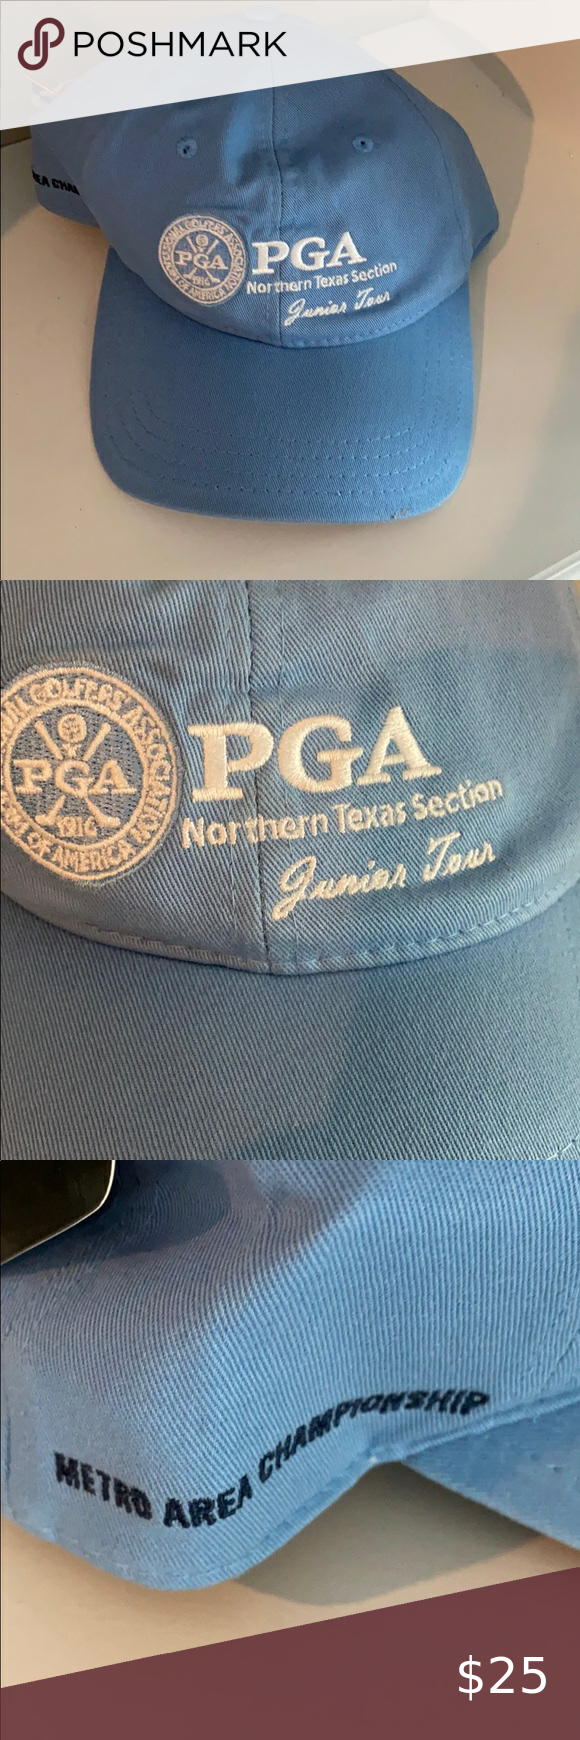 PGA Junior Tour hat. in 2020 Women shopping, Pga, Hats